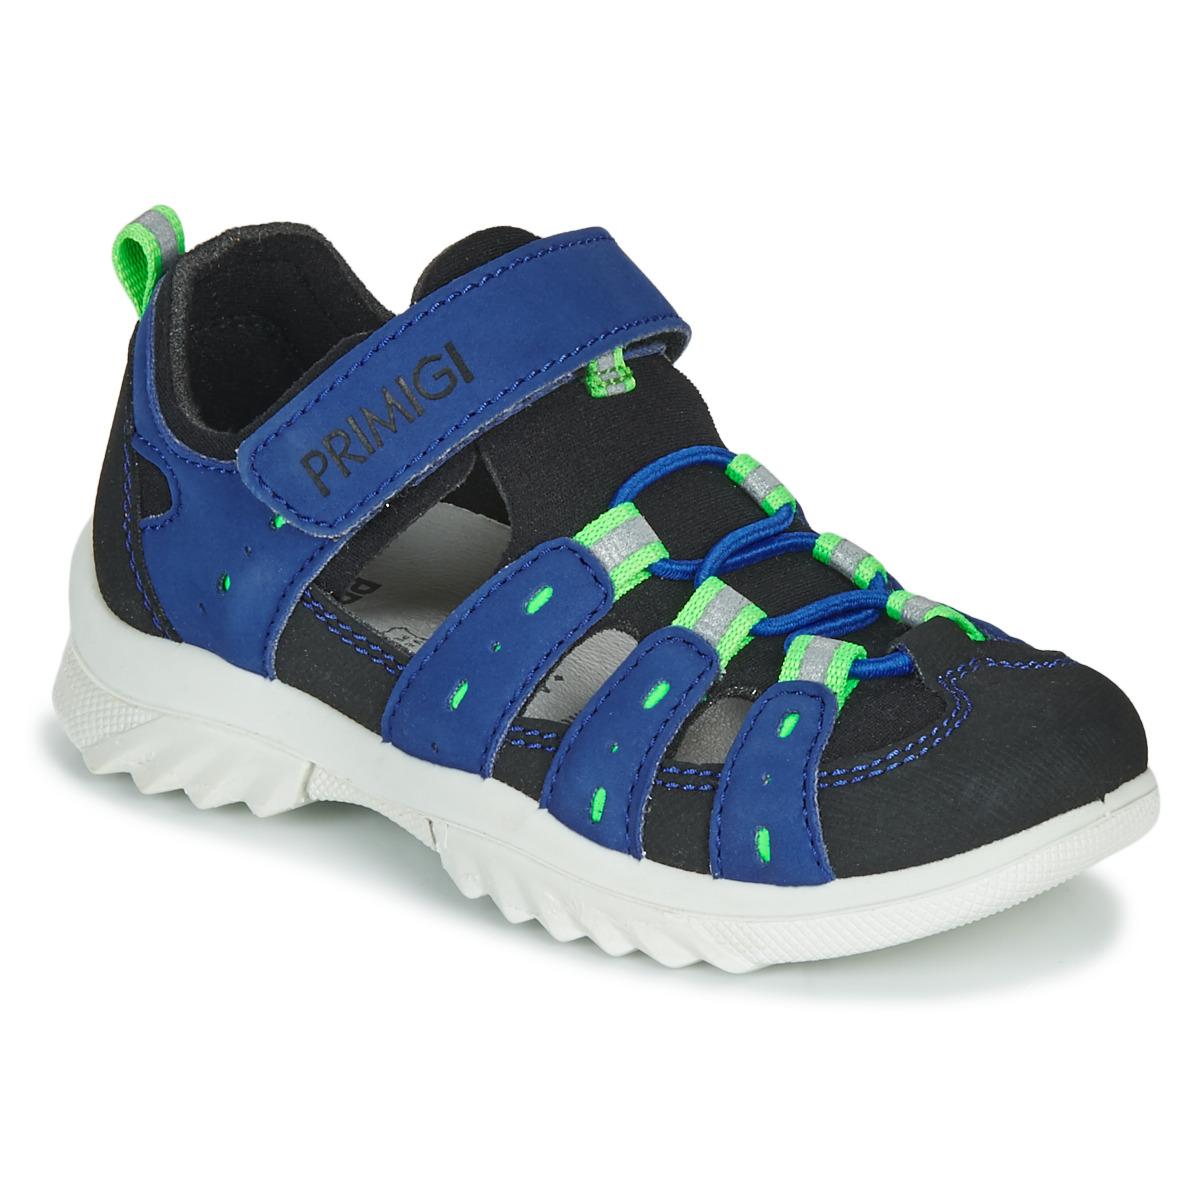 Comedia de enredo Esperar Prever  Primigi 5371822 Blue / Black - Free Delivery with Rubbersole.co.uk ! -  Shoes Sandals Child £ 53.54